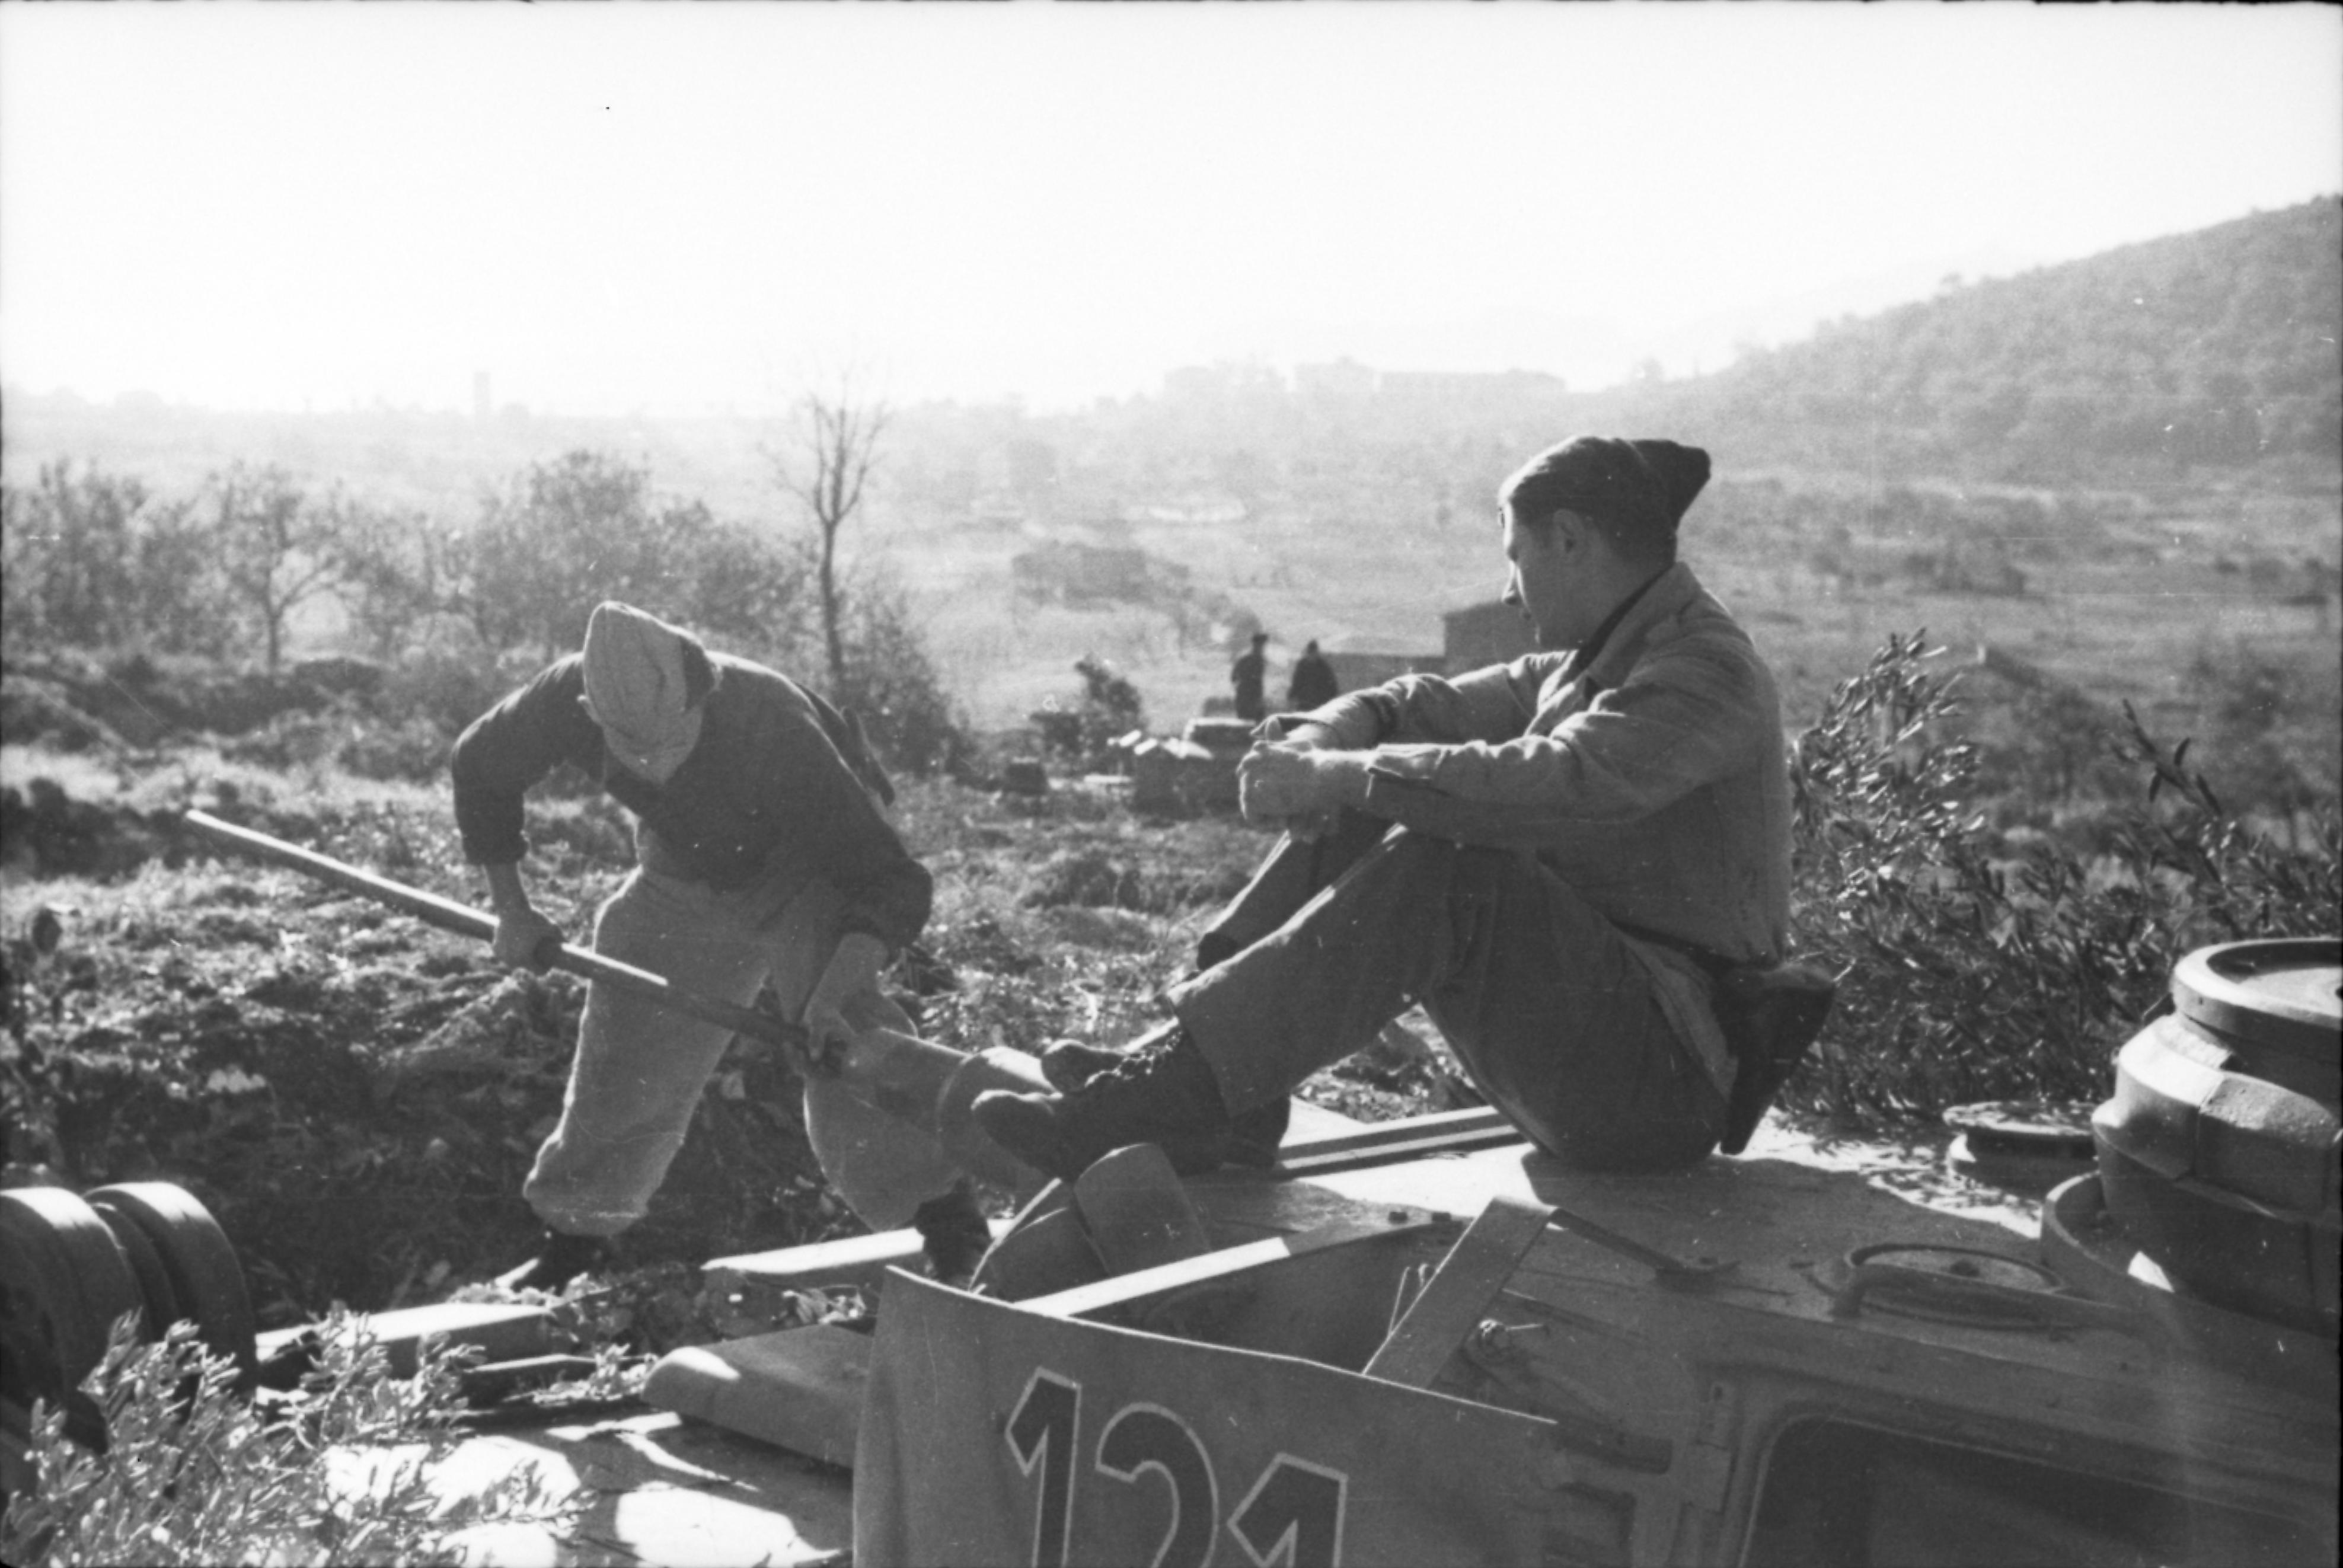 Bundesarchiv_Bild_101I-308-0799Q-15A%2C_Italien%2C_Panzer_III%2C_Tarnung.jpg